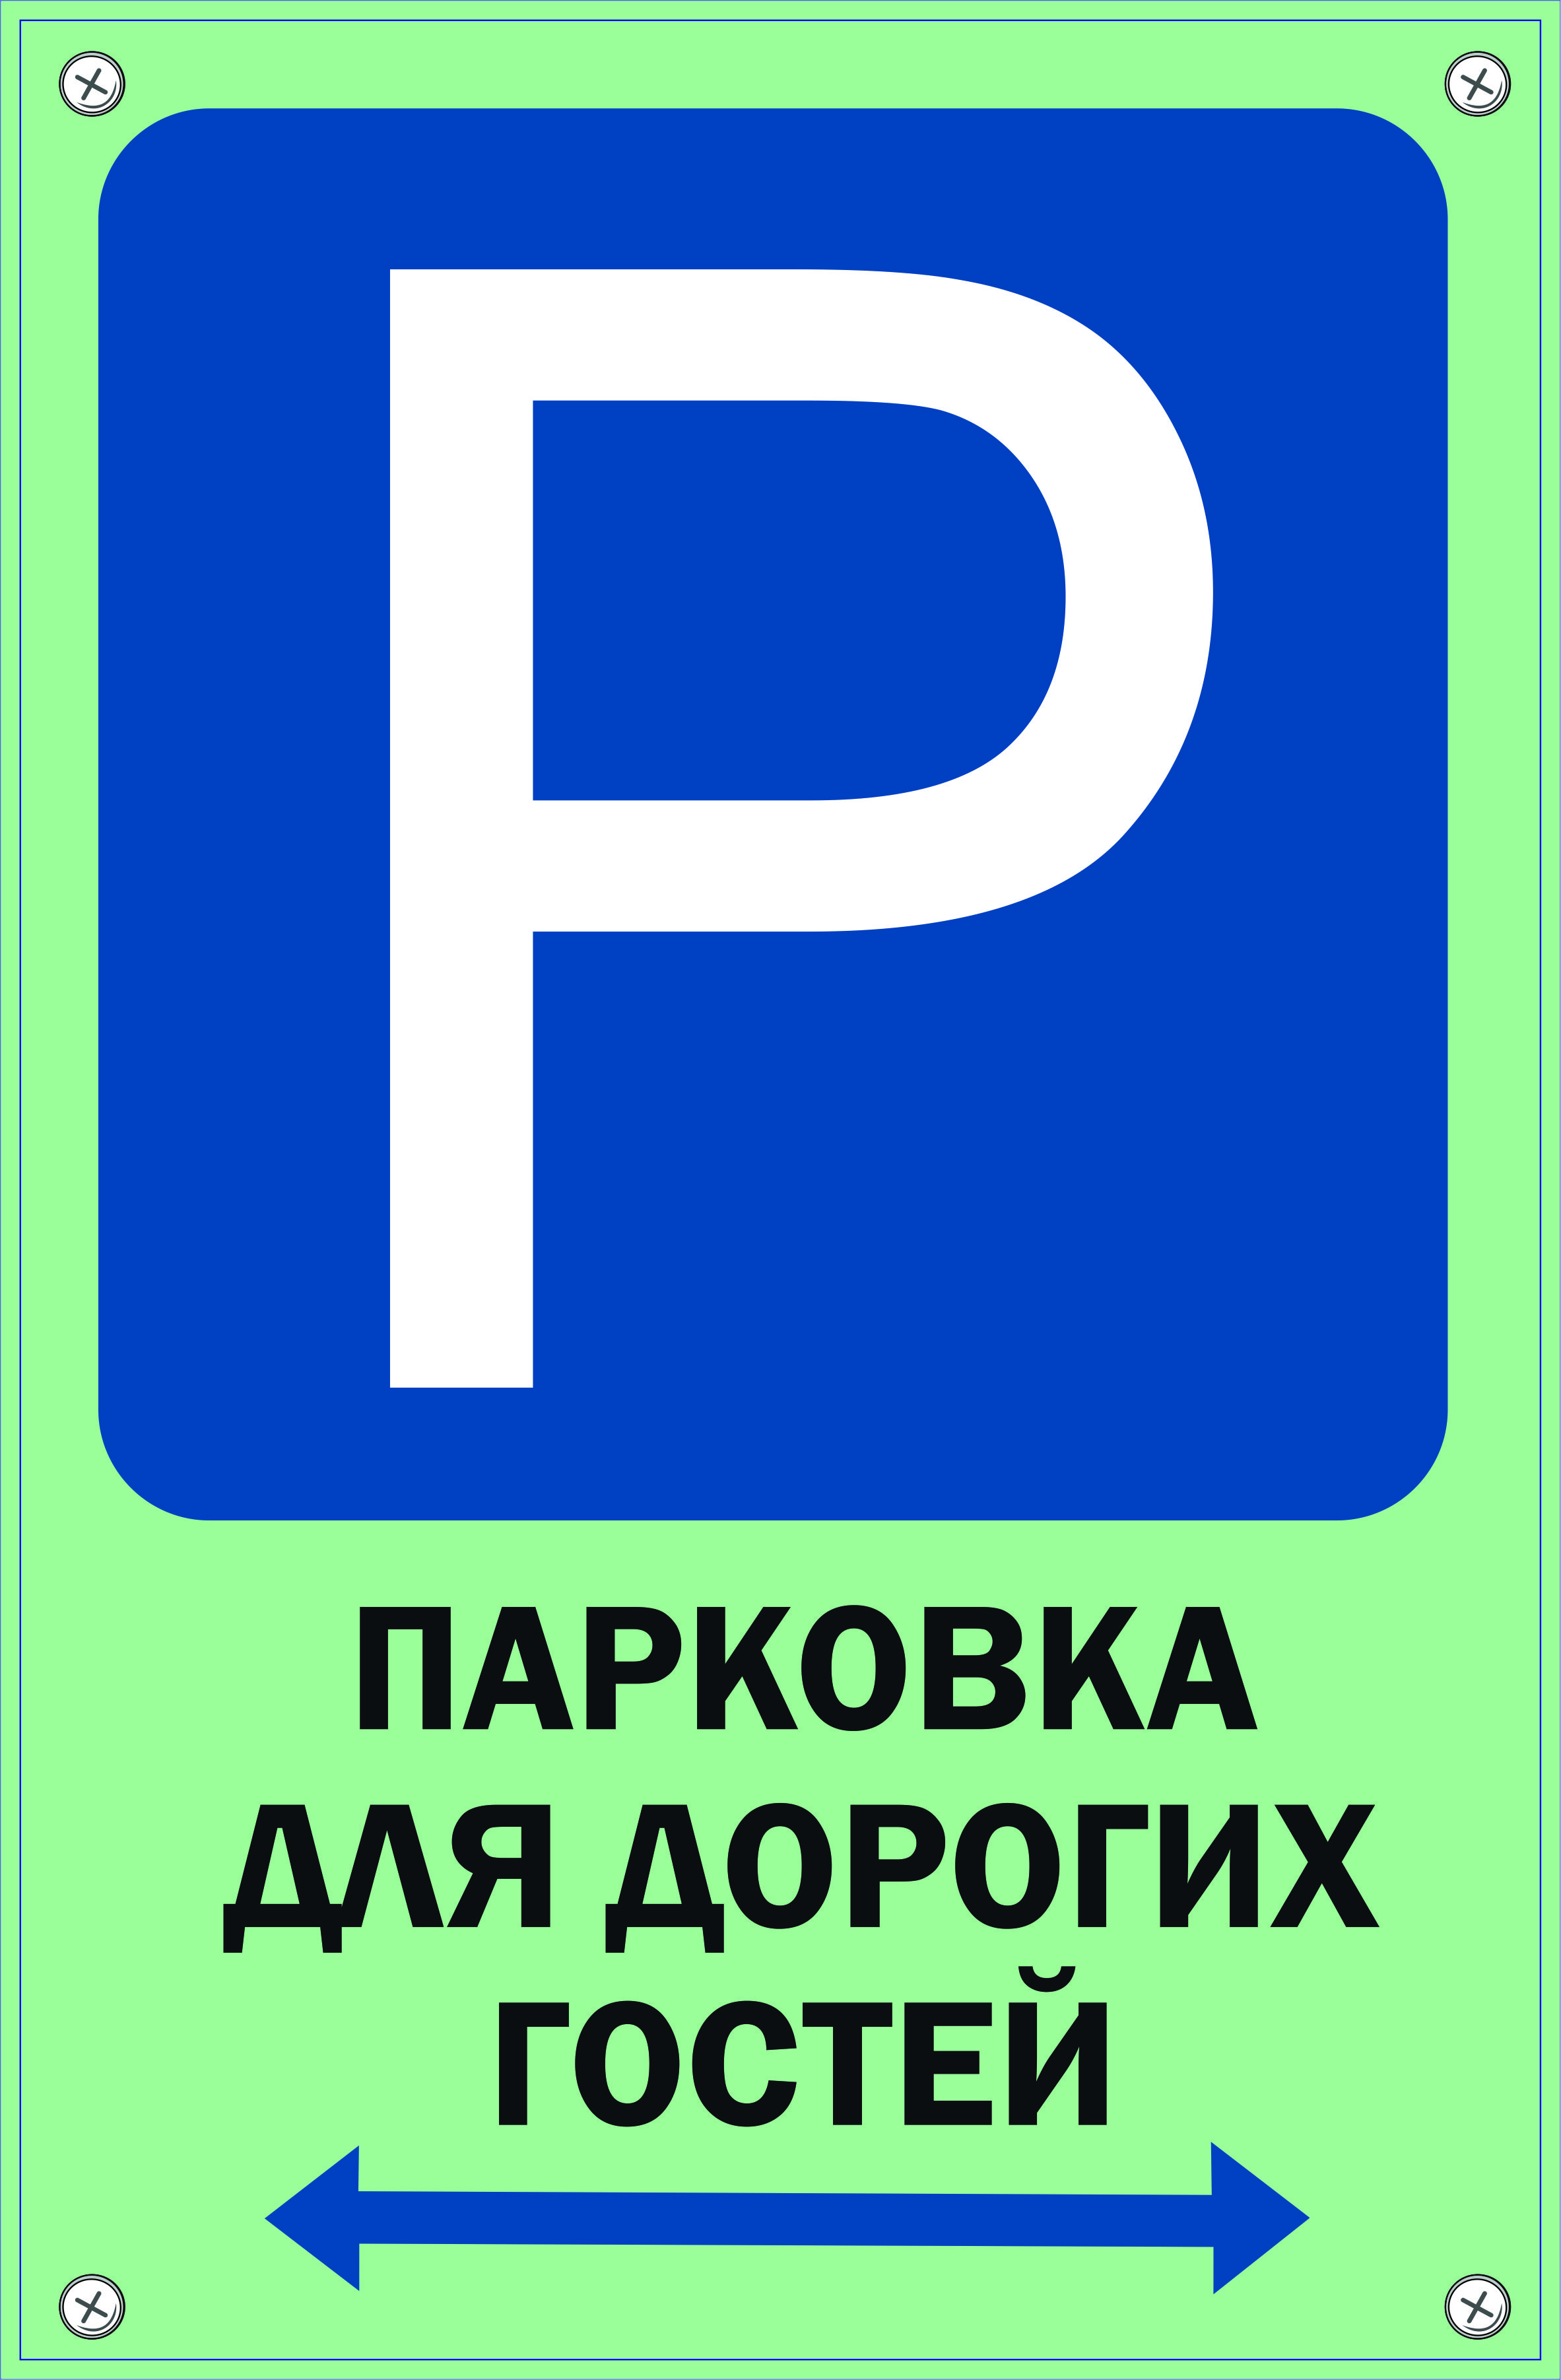 Табличка TPS 015 Парковка гости, пластик 3 мм,30*19,5 см табличка tps 004 собака без привязи пластик 3 мм 30 19 5 см